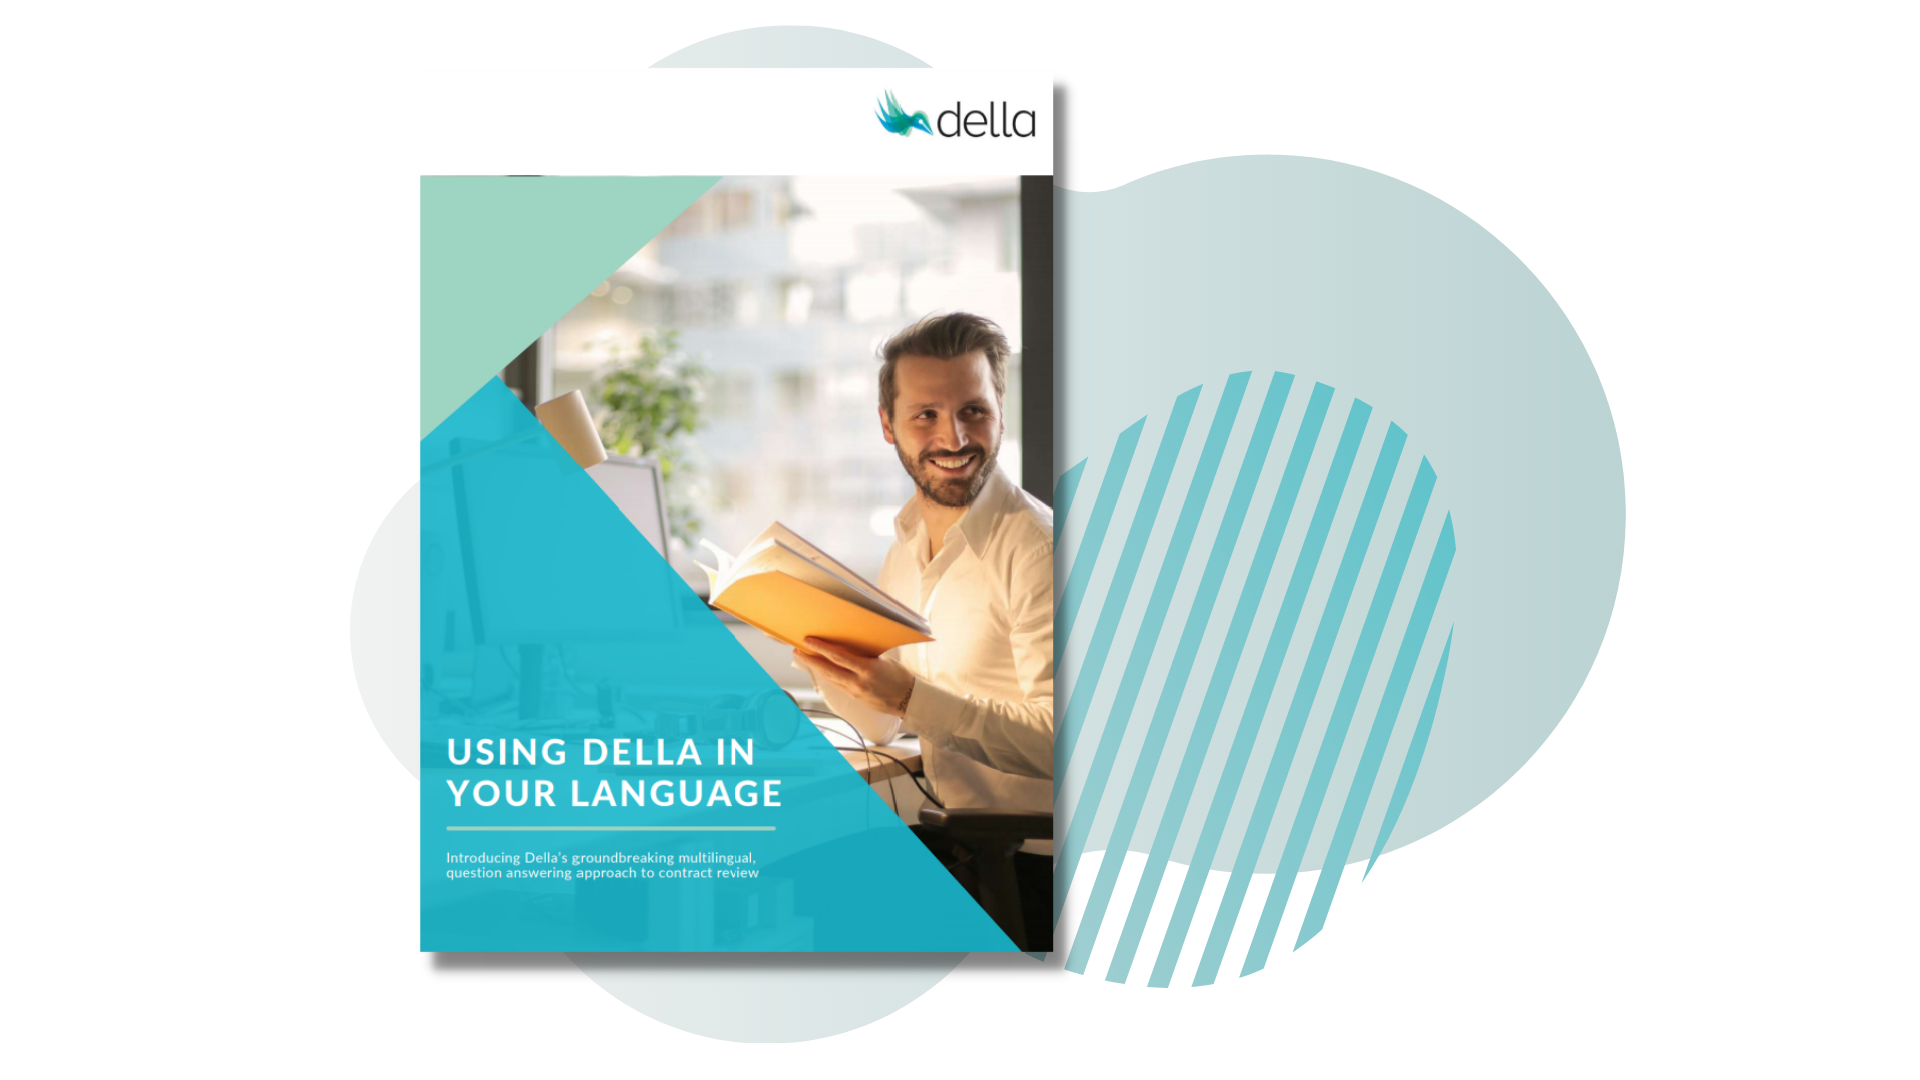 Using Della in your language